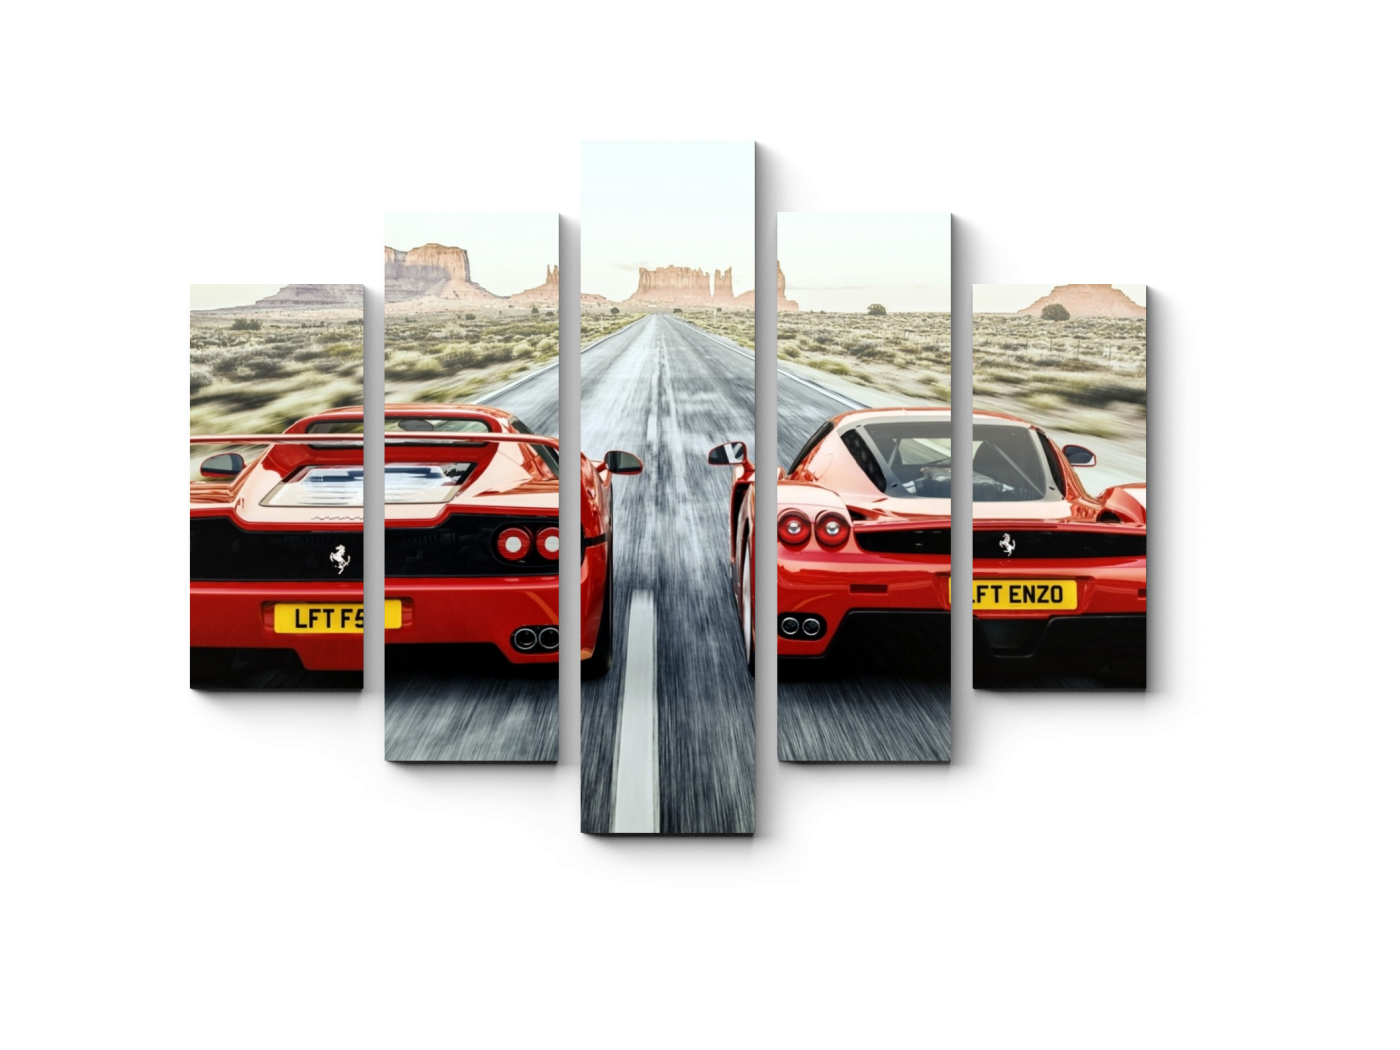 Модульная картина Наперегонки с братом (75x60) фото